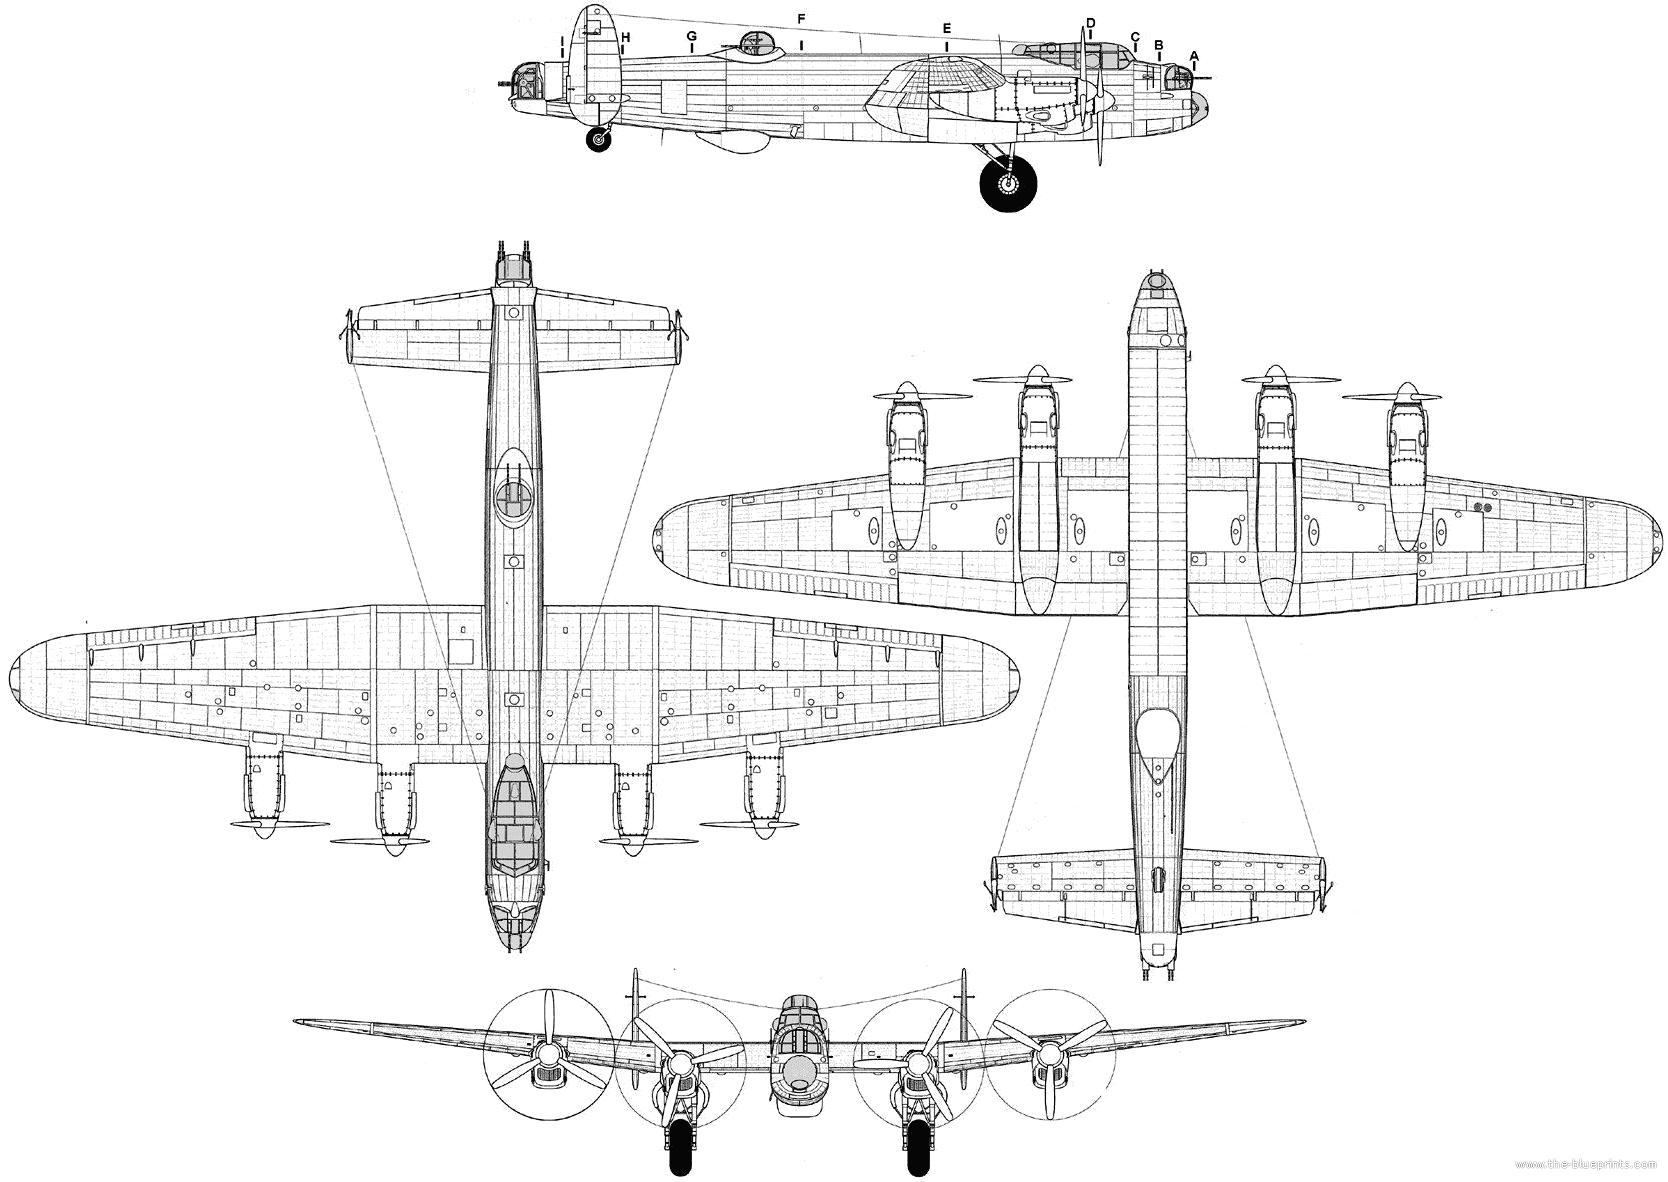 Aviones De La Segunda Guerra Mundial Avro 683 Lancaster